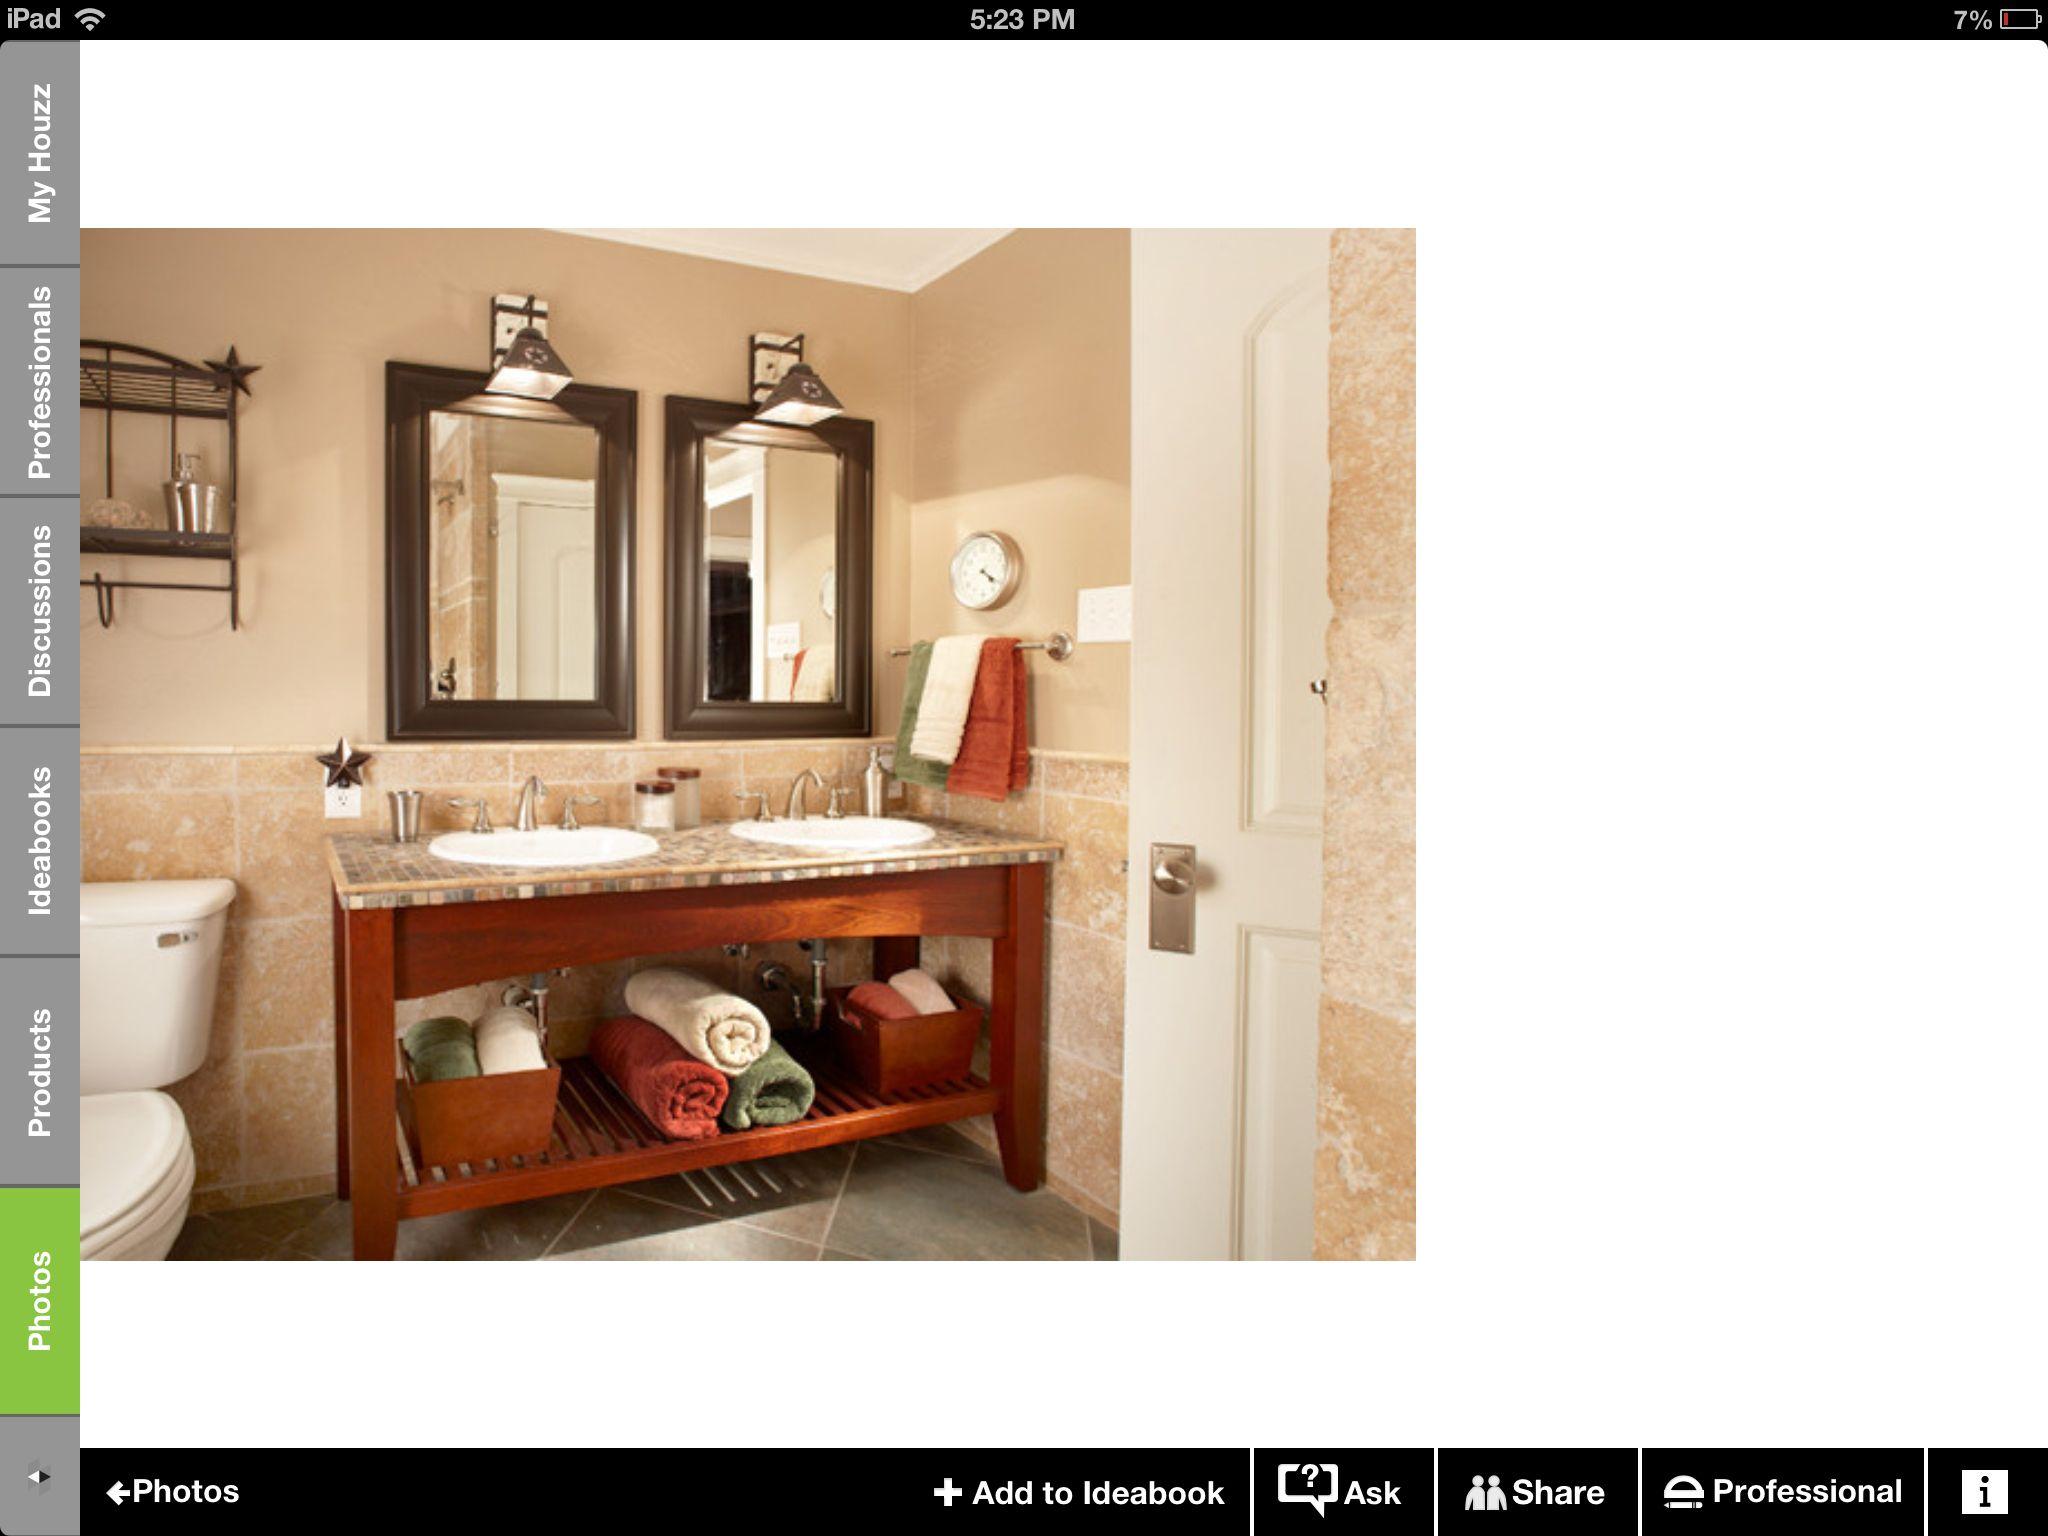 jack and jill bathroom ideas new house ideas pinterest